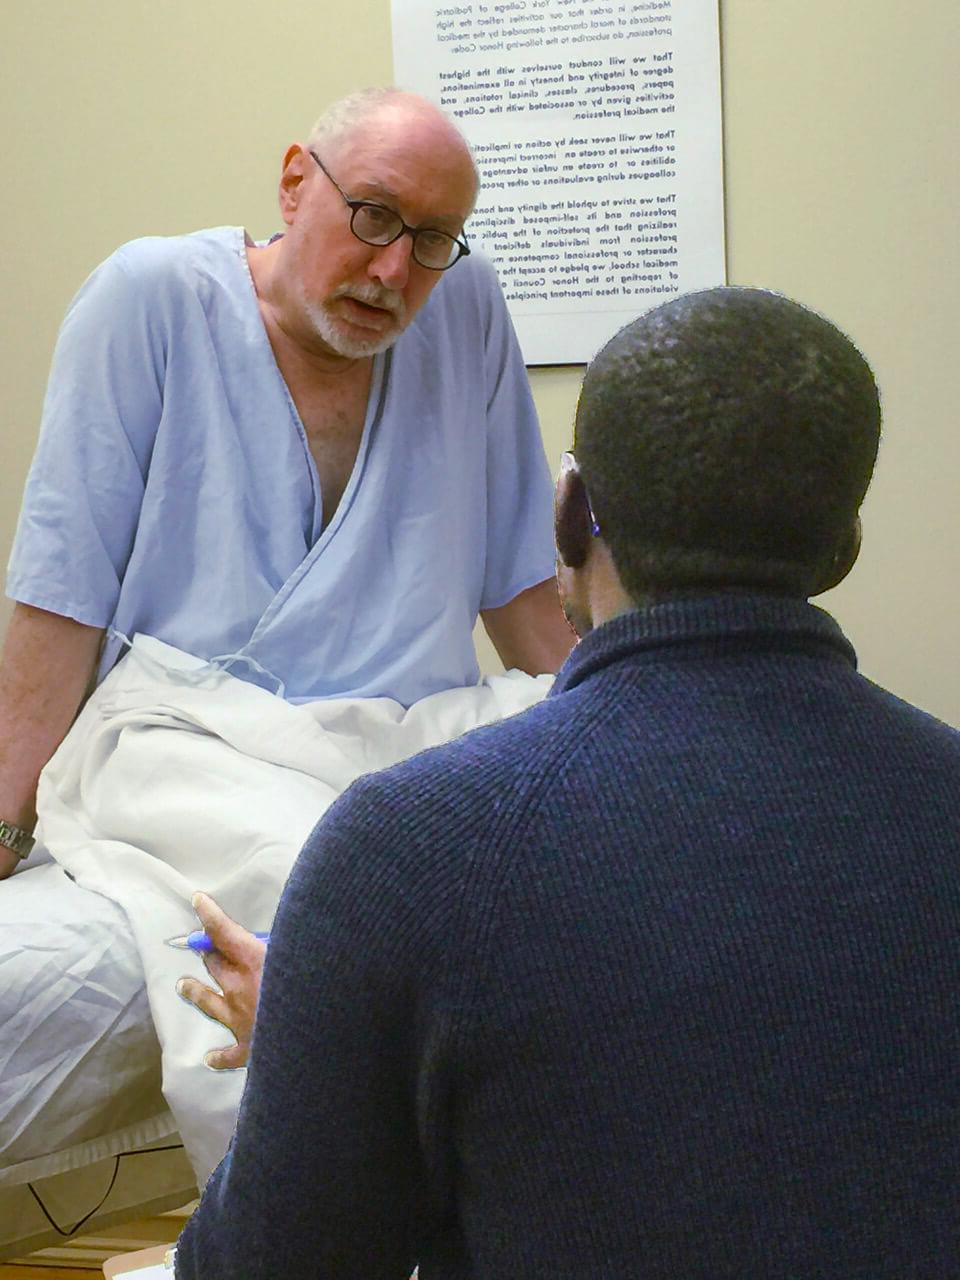 A Standardized Patient portrays a case study during a c3ny Step 2 CS Prep Workshop.